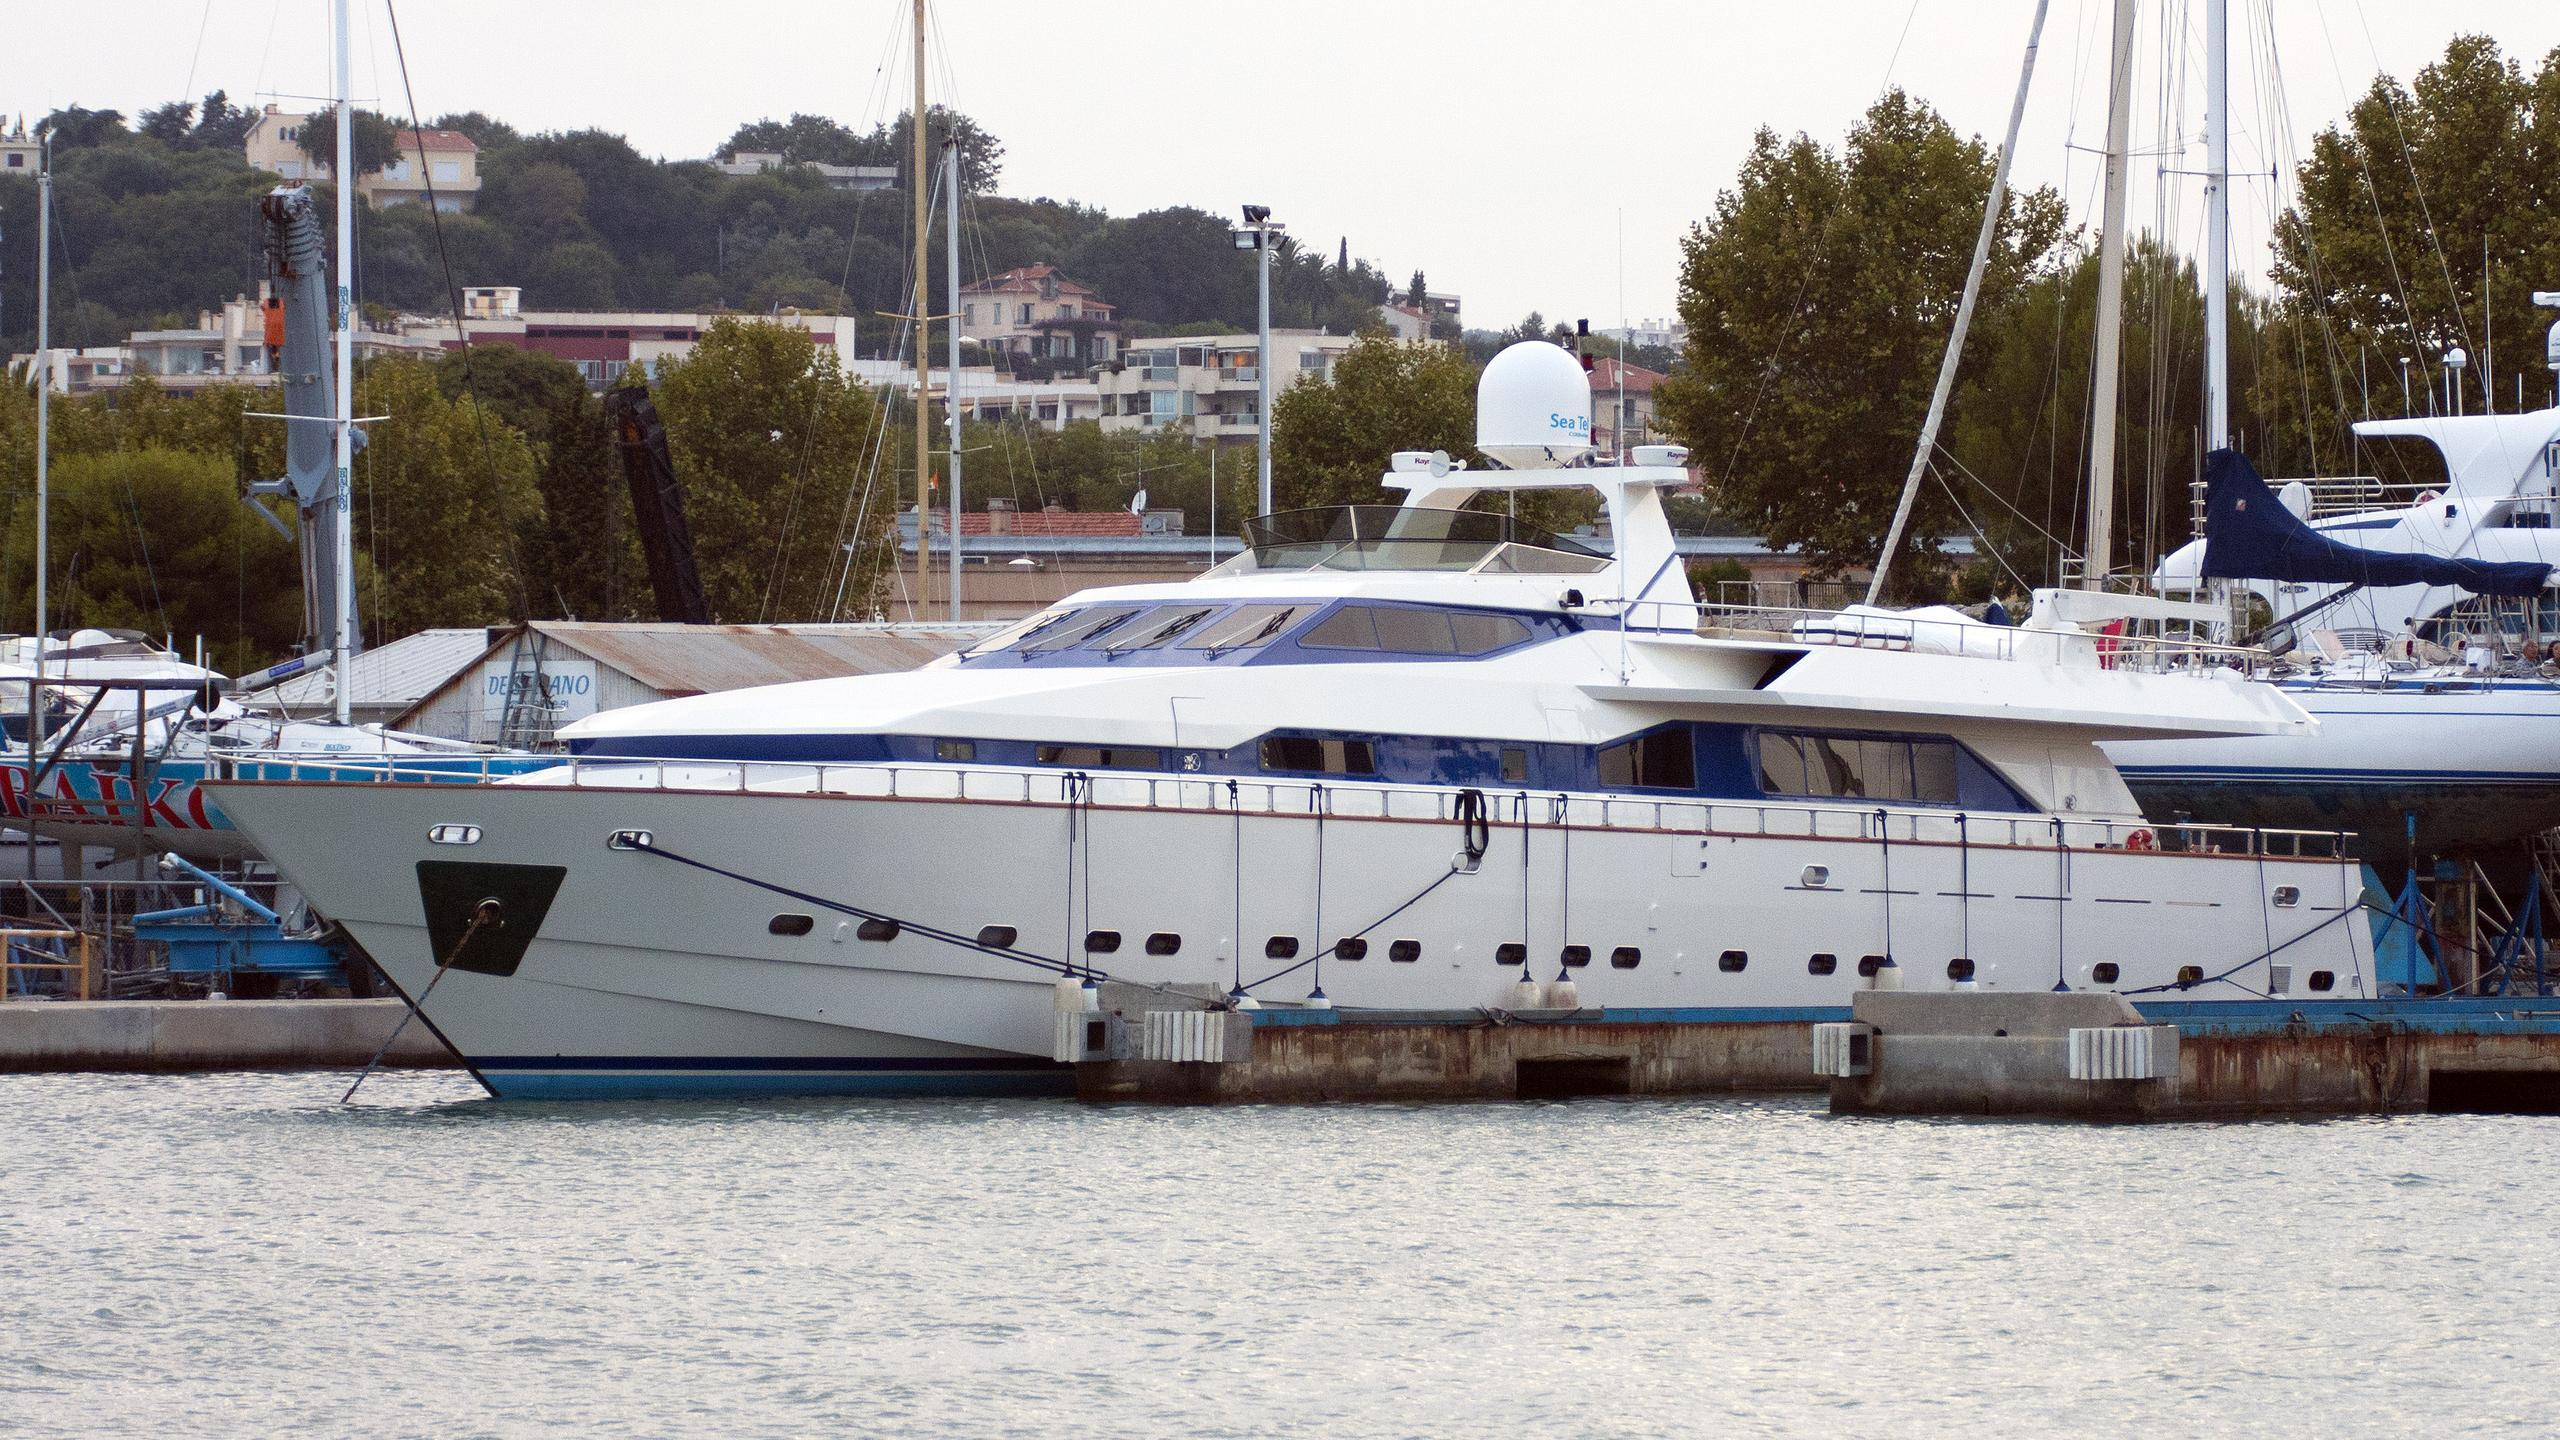 the-journey-motor-yacht-tecnomarine-t120-1989-37m-profile